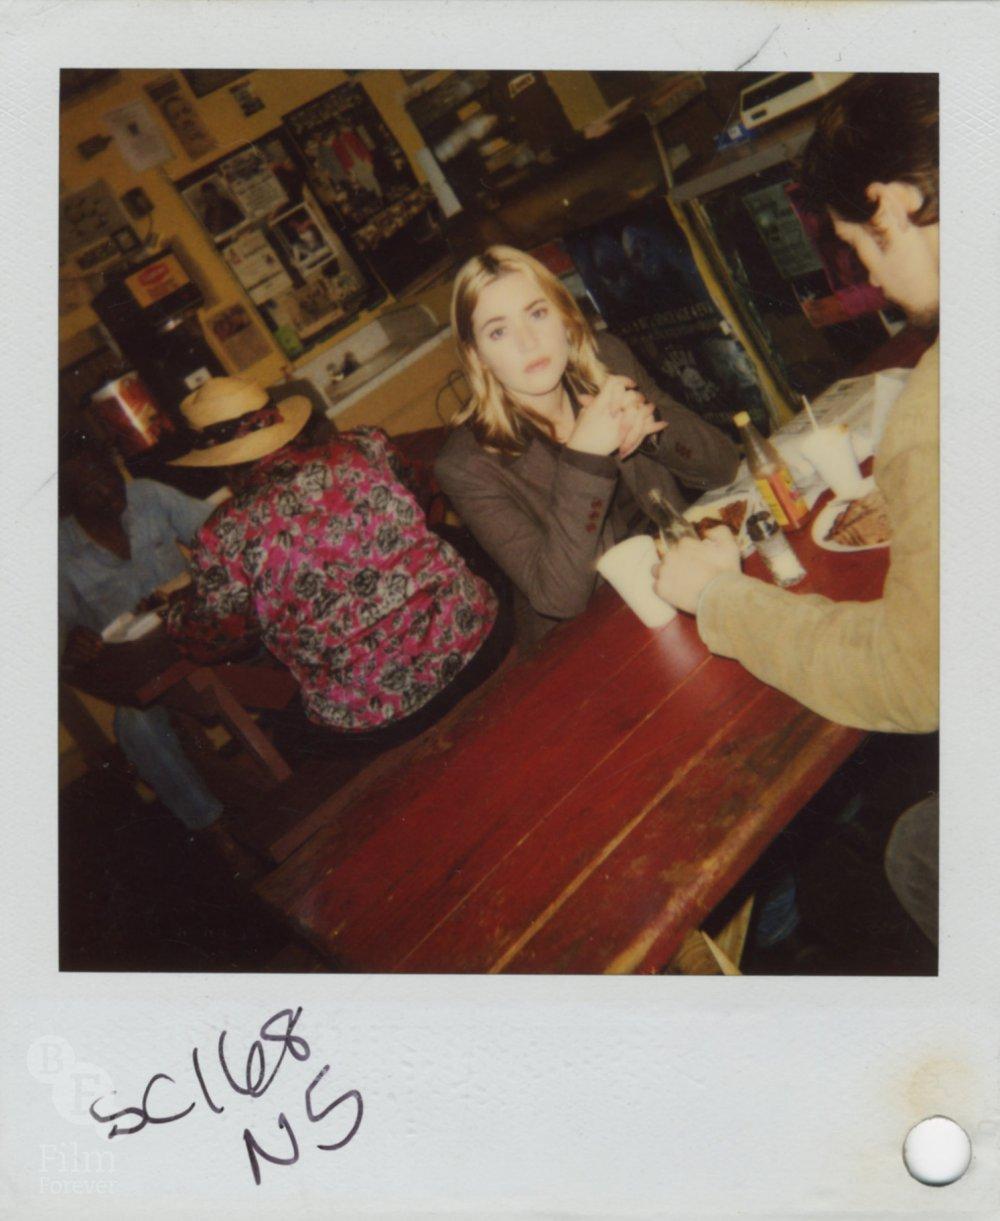 The Life of David Gale (2003) costume continuity Polaroid